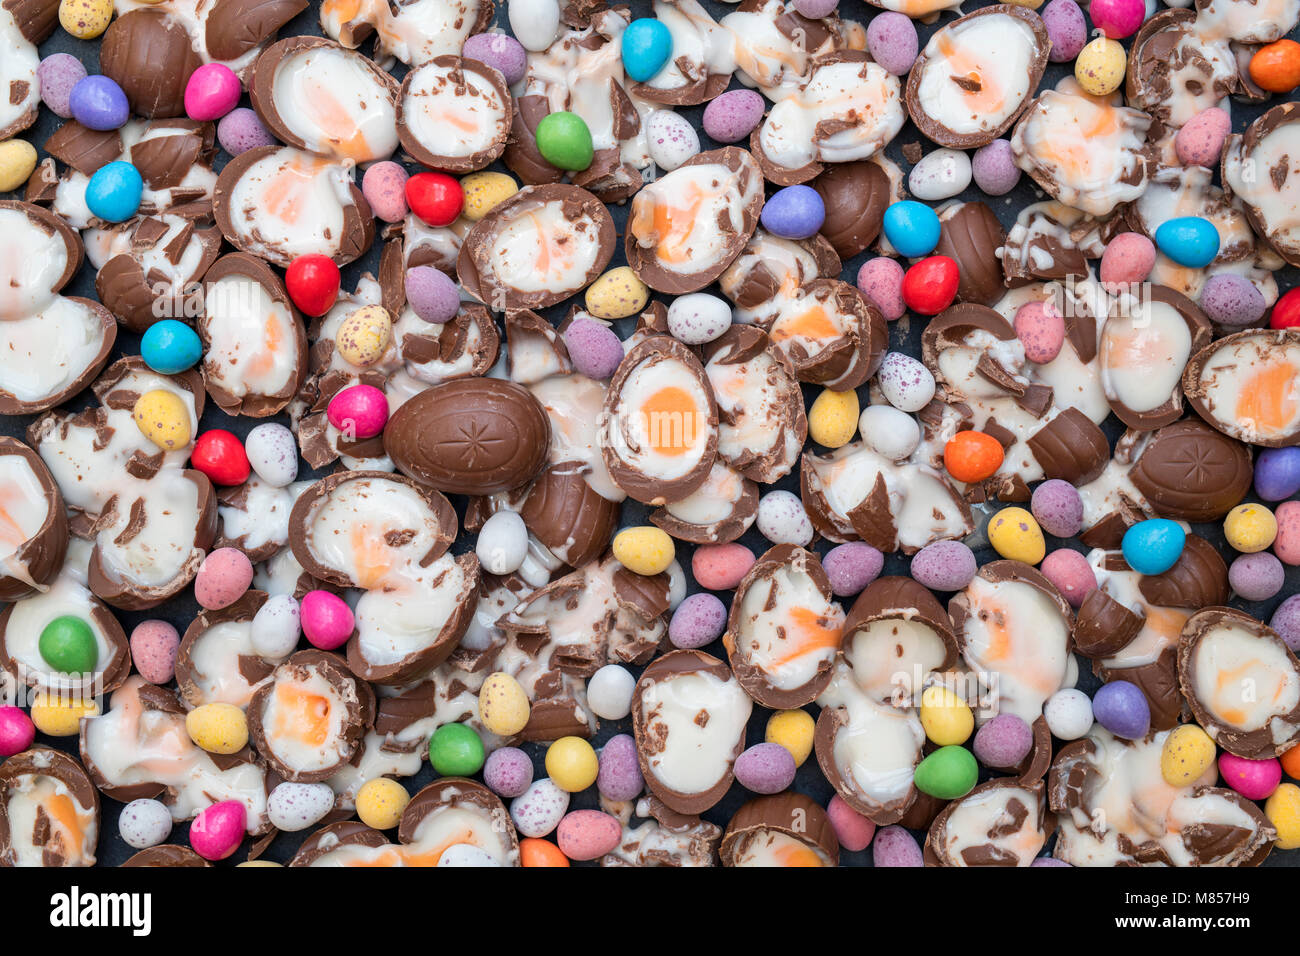 Have a smashing Easter.  Smashed Cadburys creme eggs with chocolate mini eggs on a slate background - Stock Image